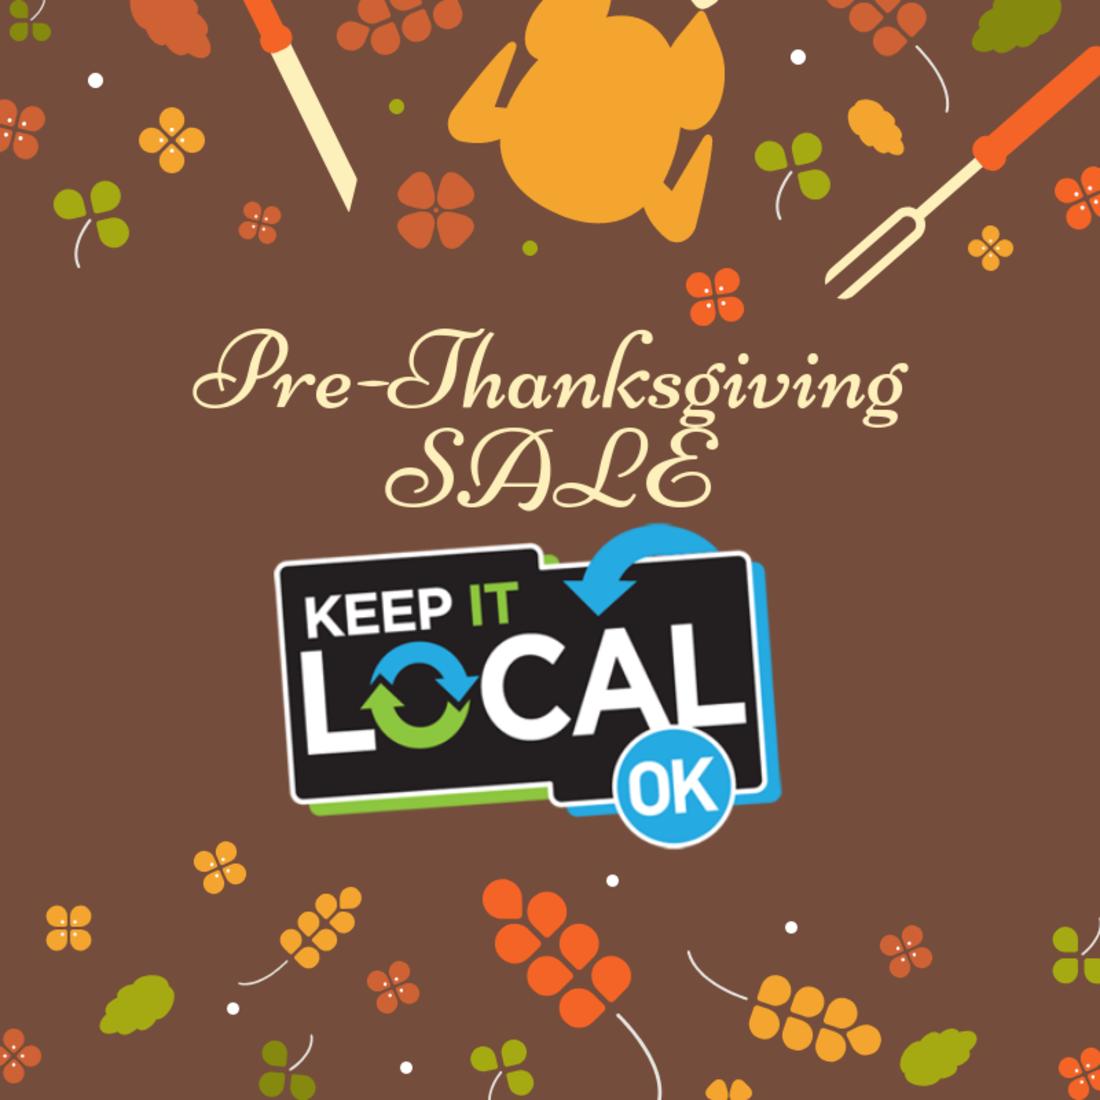 November Keep It Local Perk: Annual Pre-Thanksgiving Day Sale